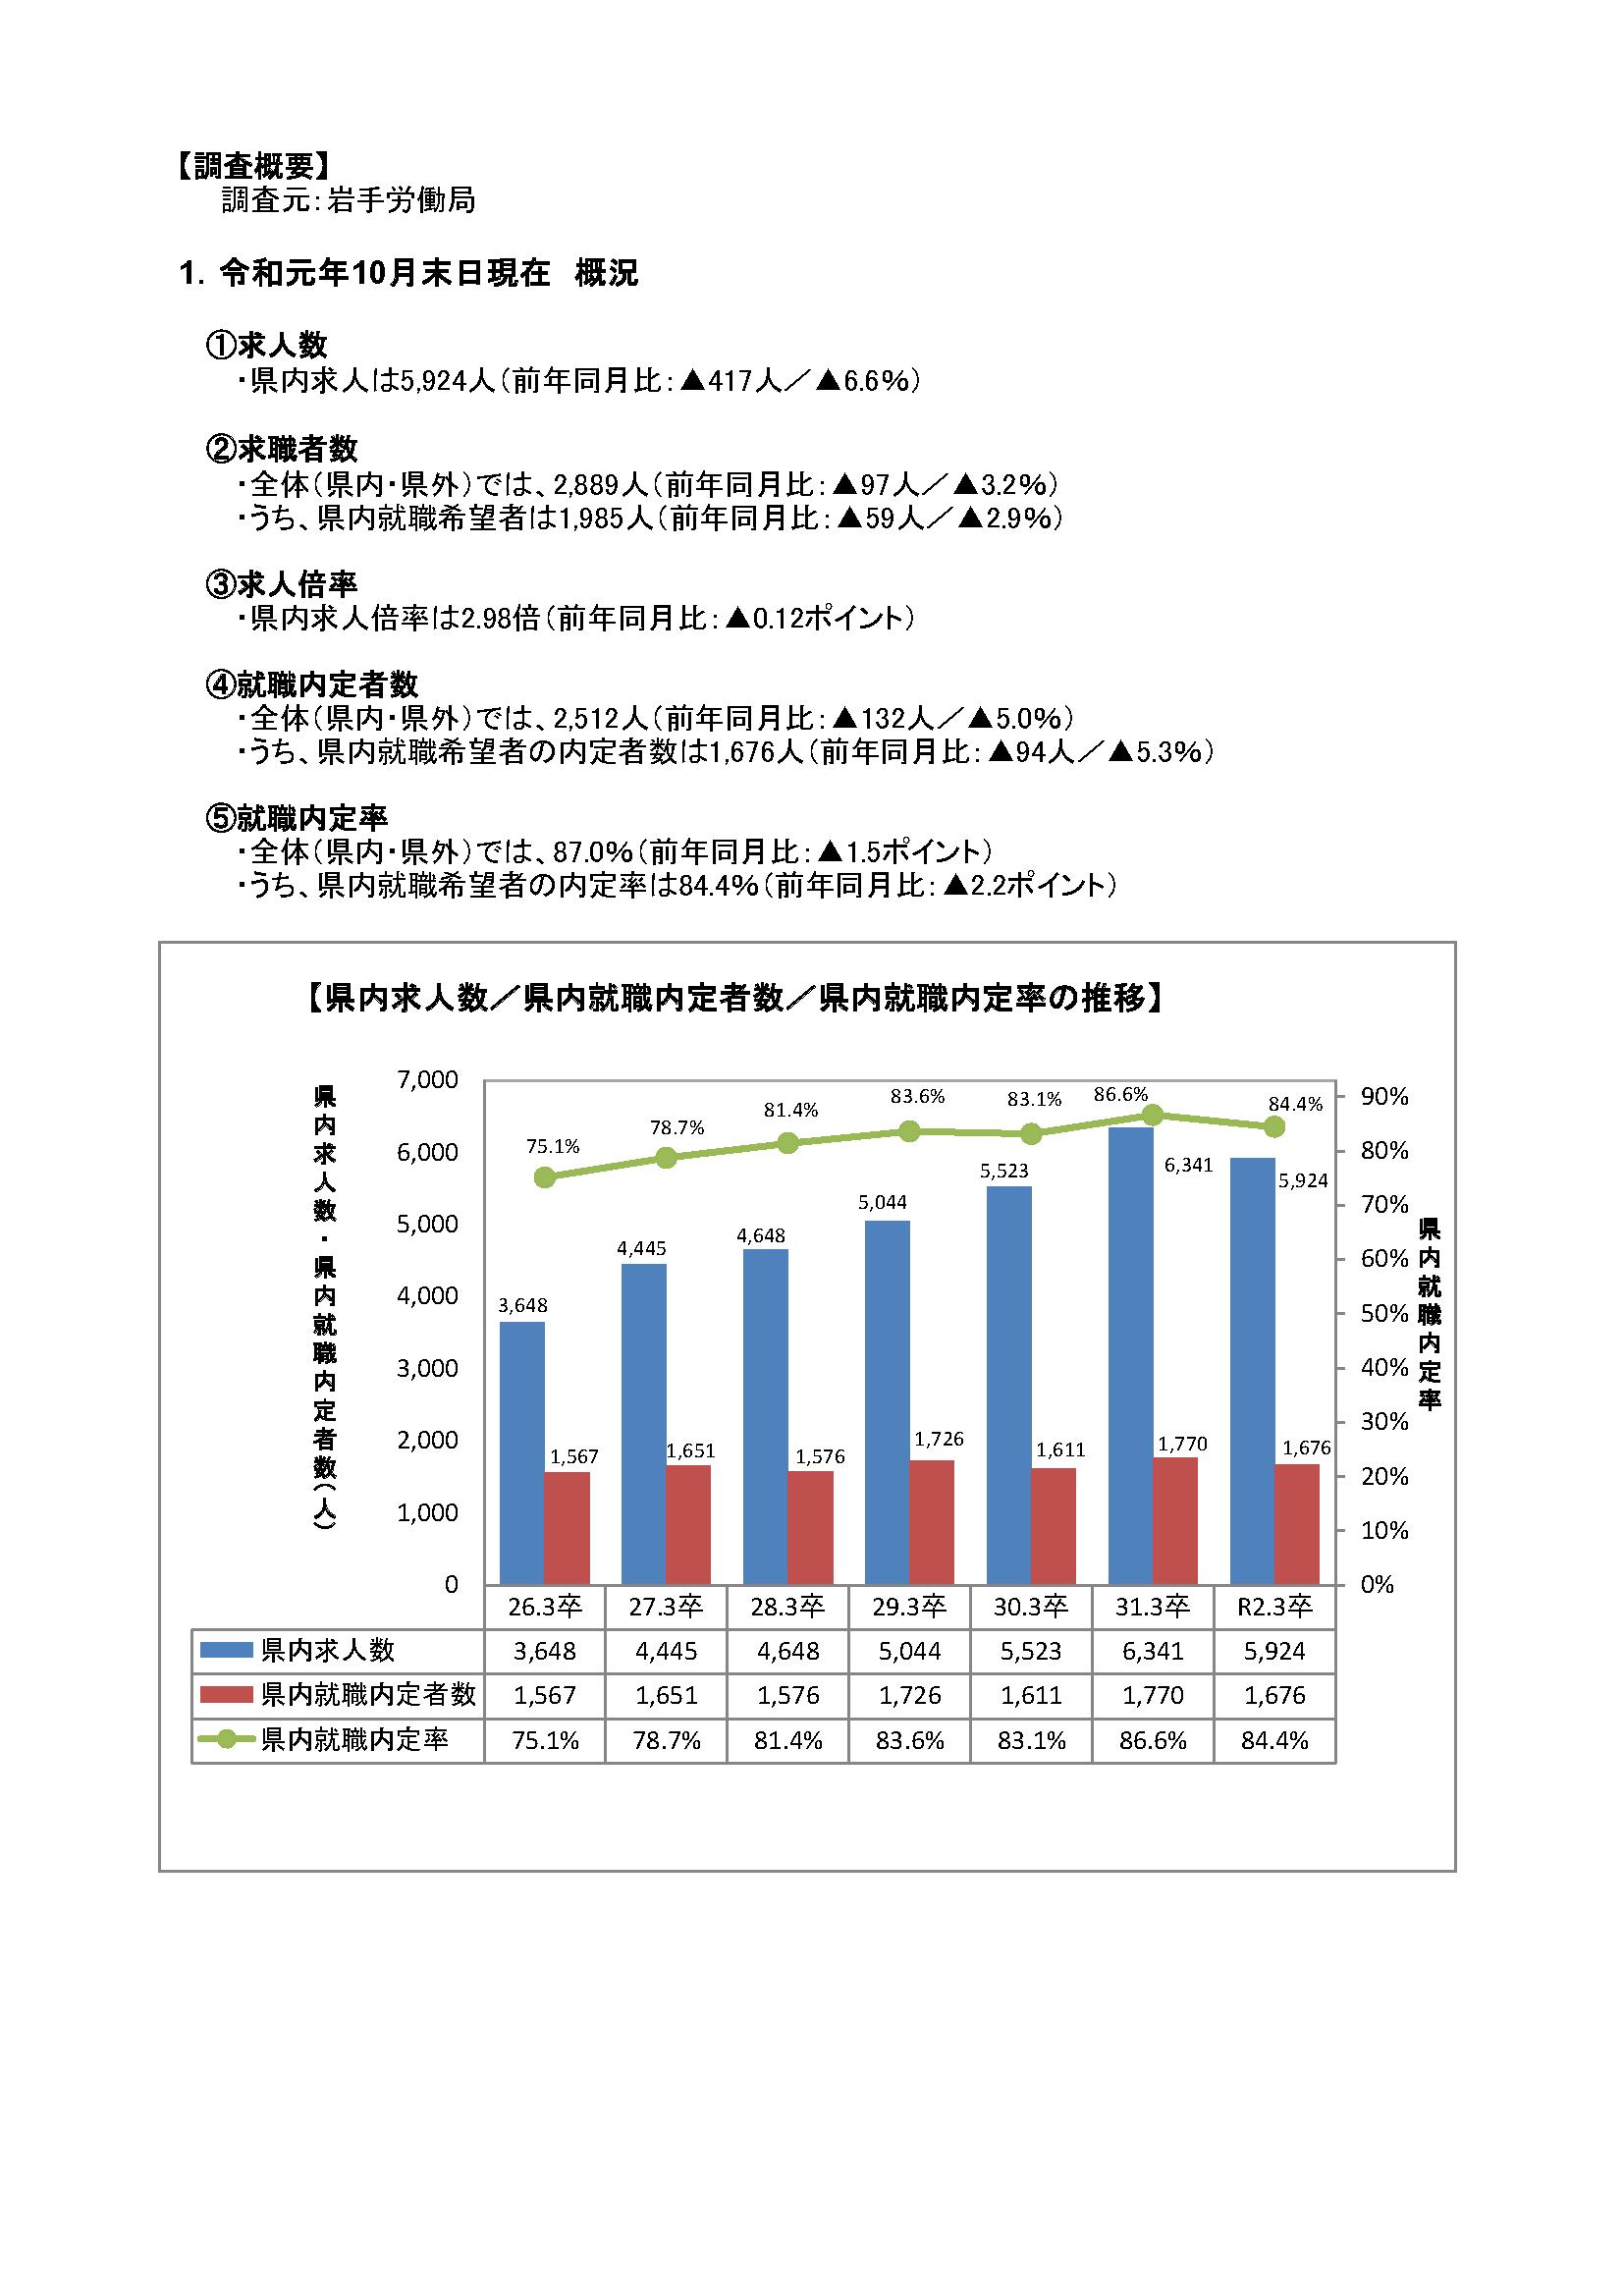 R2.3月高卒者職業紹介状況資料(201911月末現在)